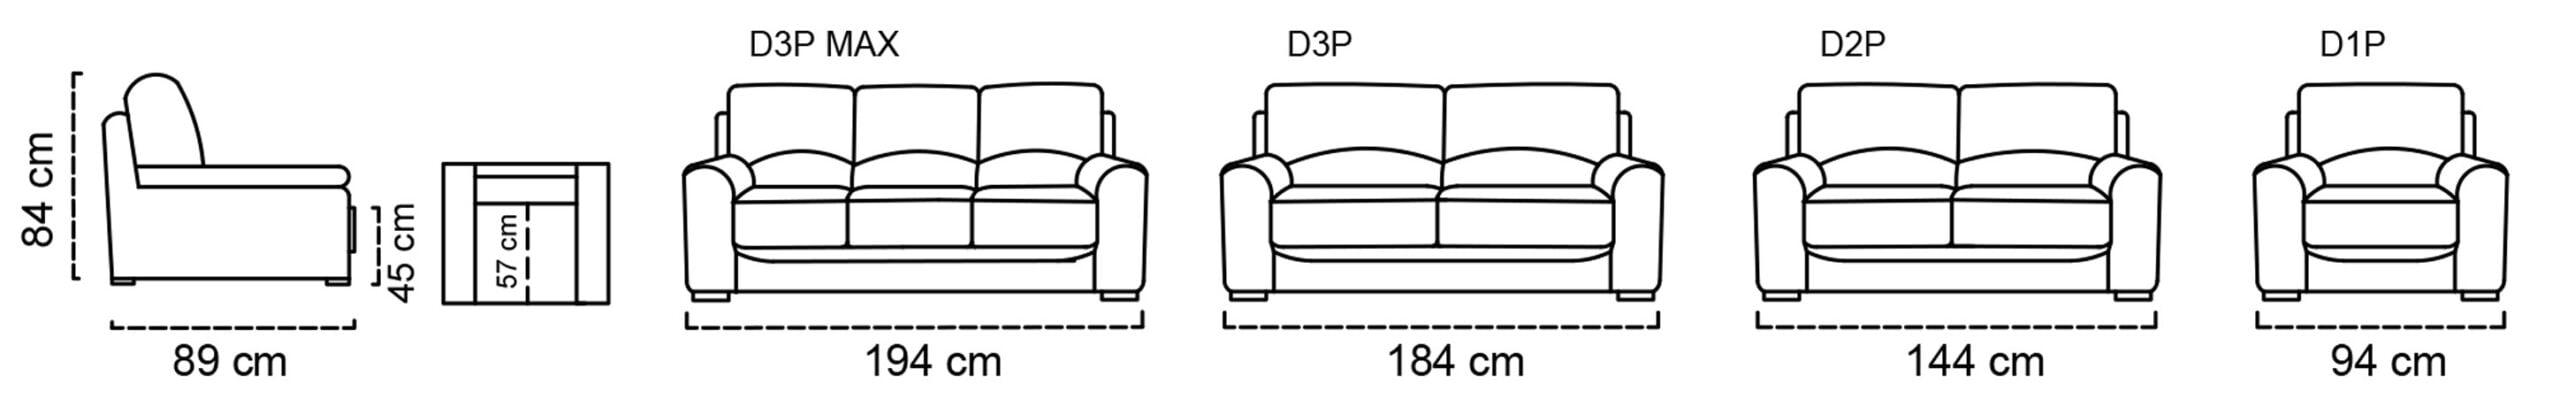 delphine sofa giotto living sofa relax sofa ange sofa sofabed